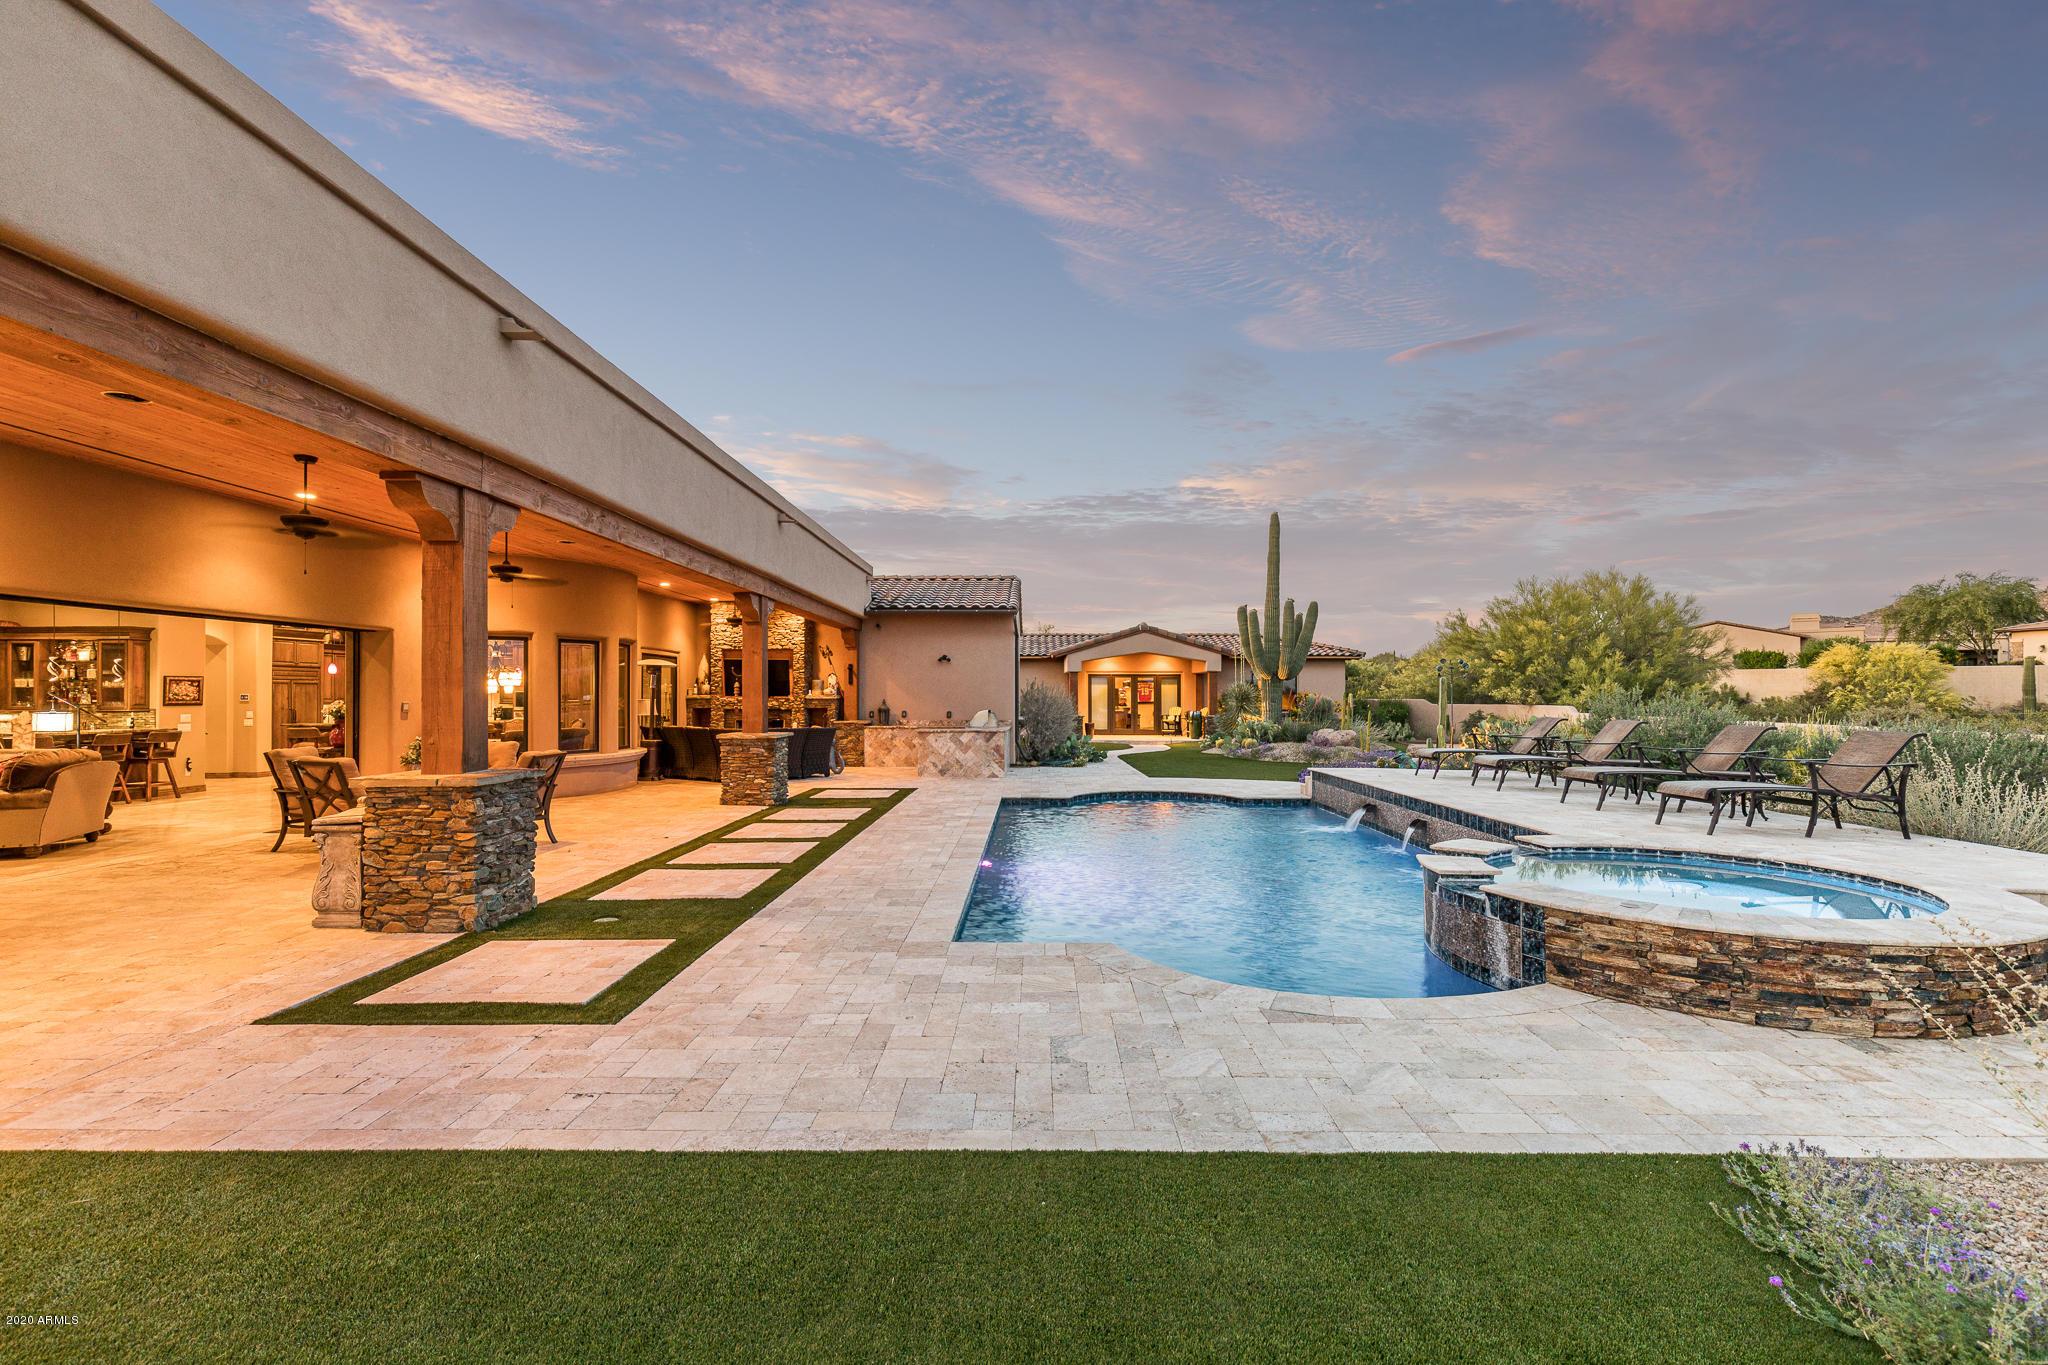 Photo of 25651 N 88TH Way, Scottsdale, AZ 85255